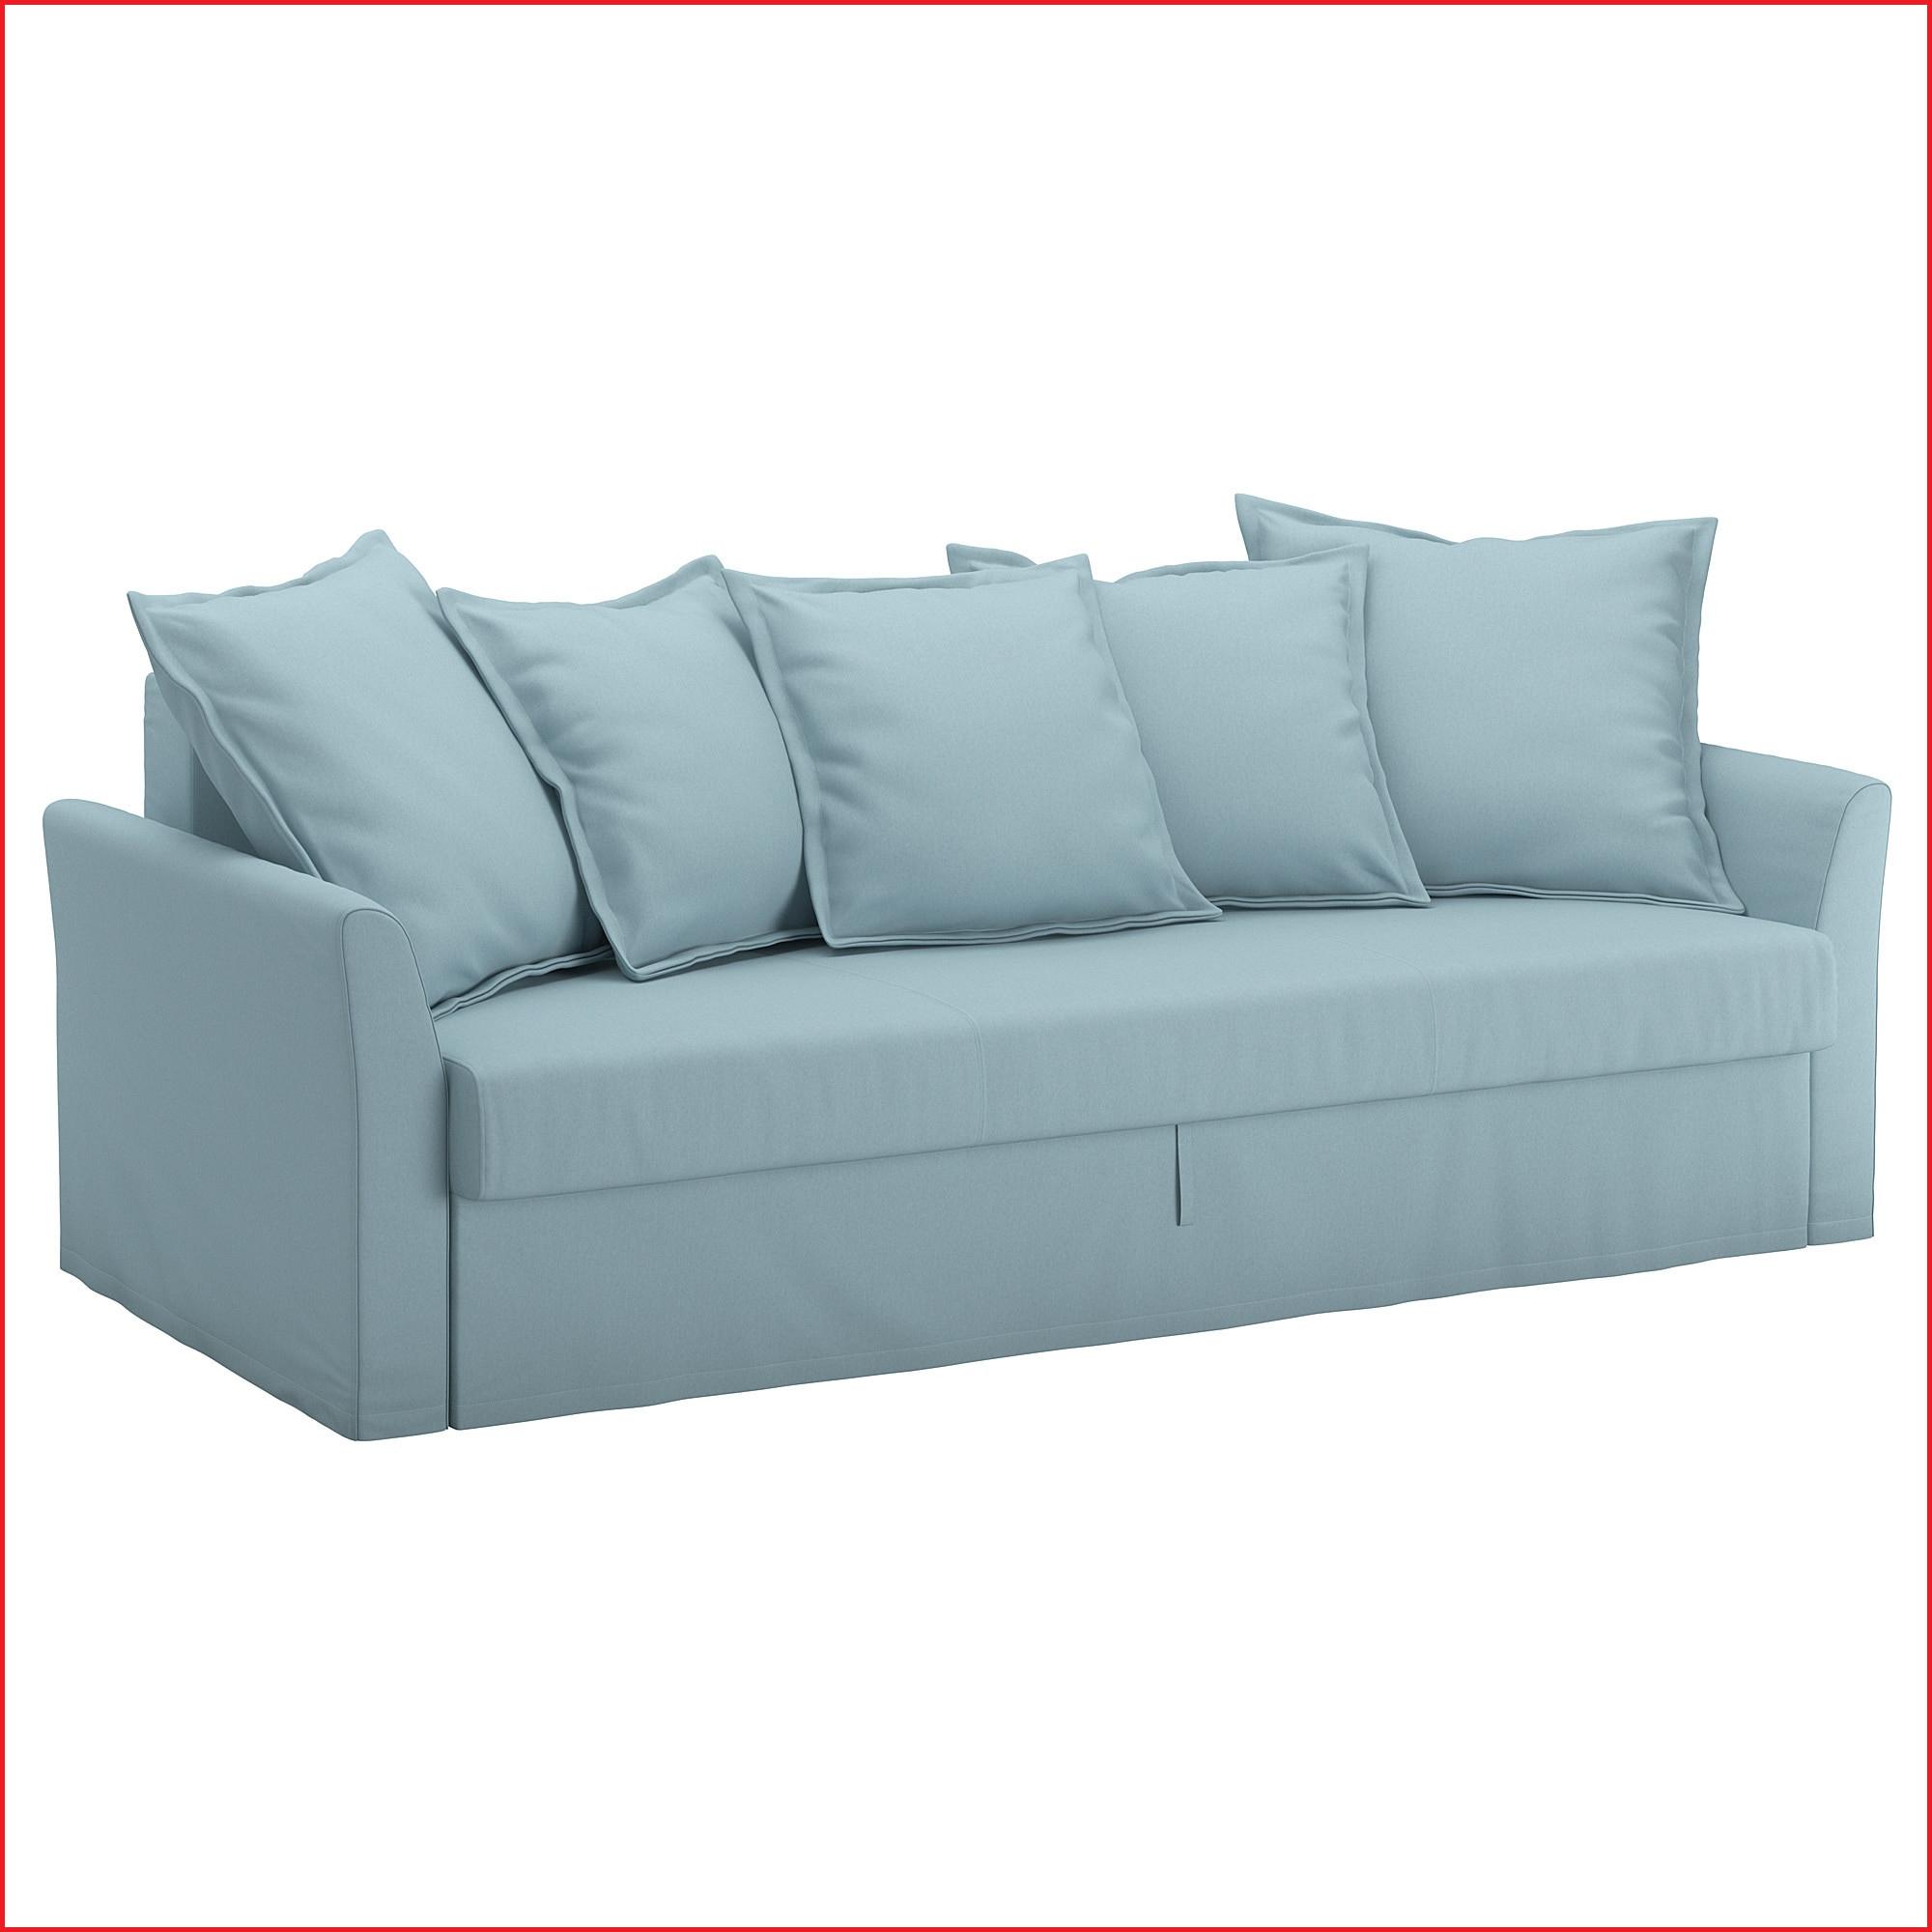 Ikea sofas Cama Xtd6 sofas Cama Ikea sofà S Cama Y Sillones Cama Decoracià N